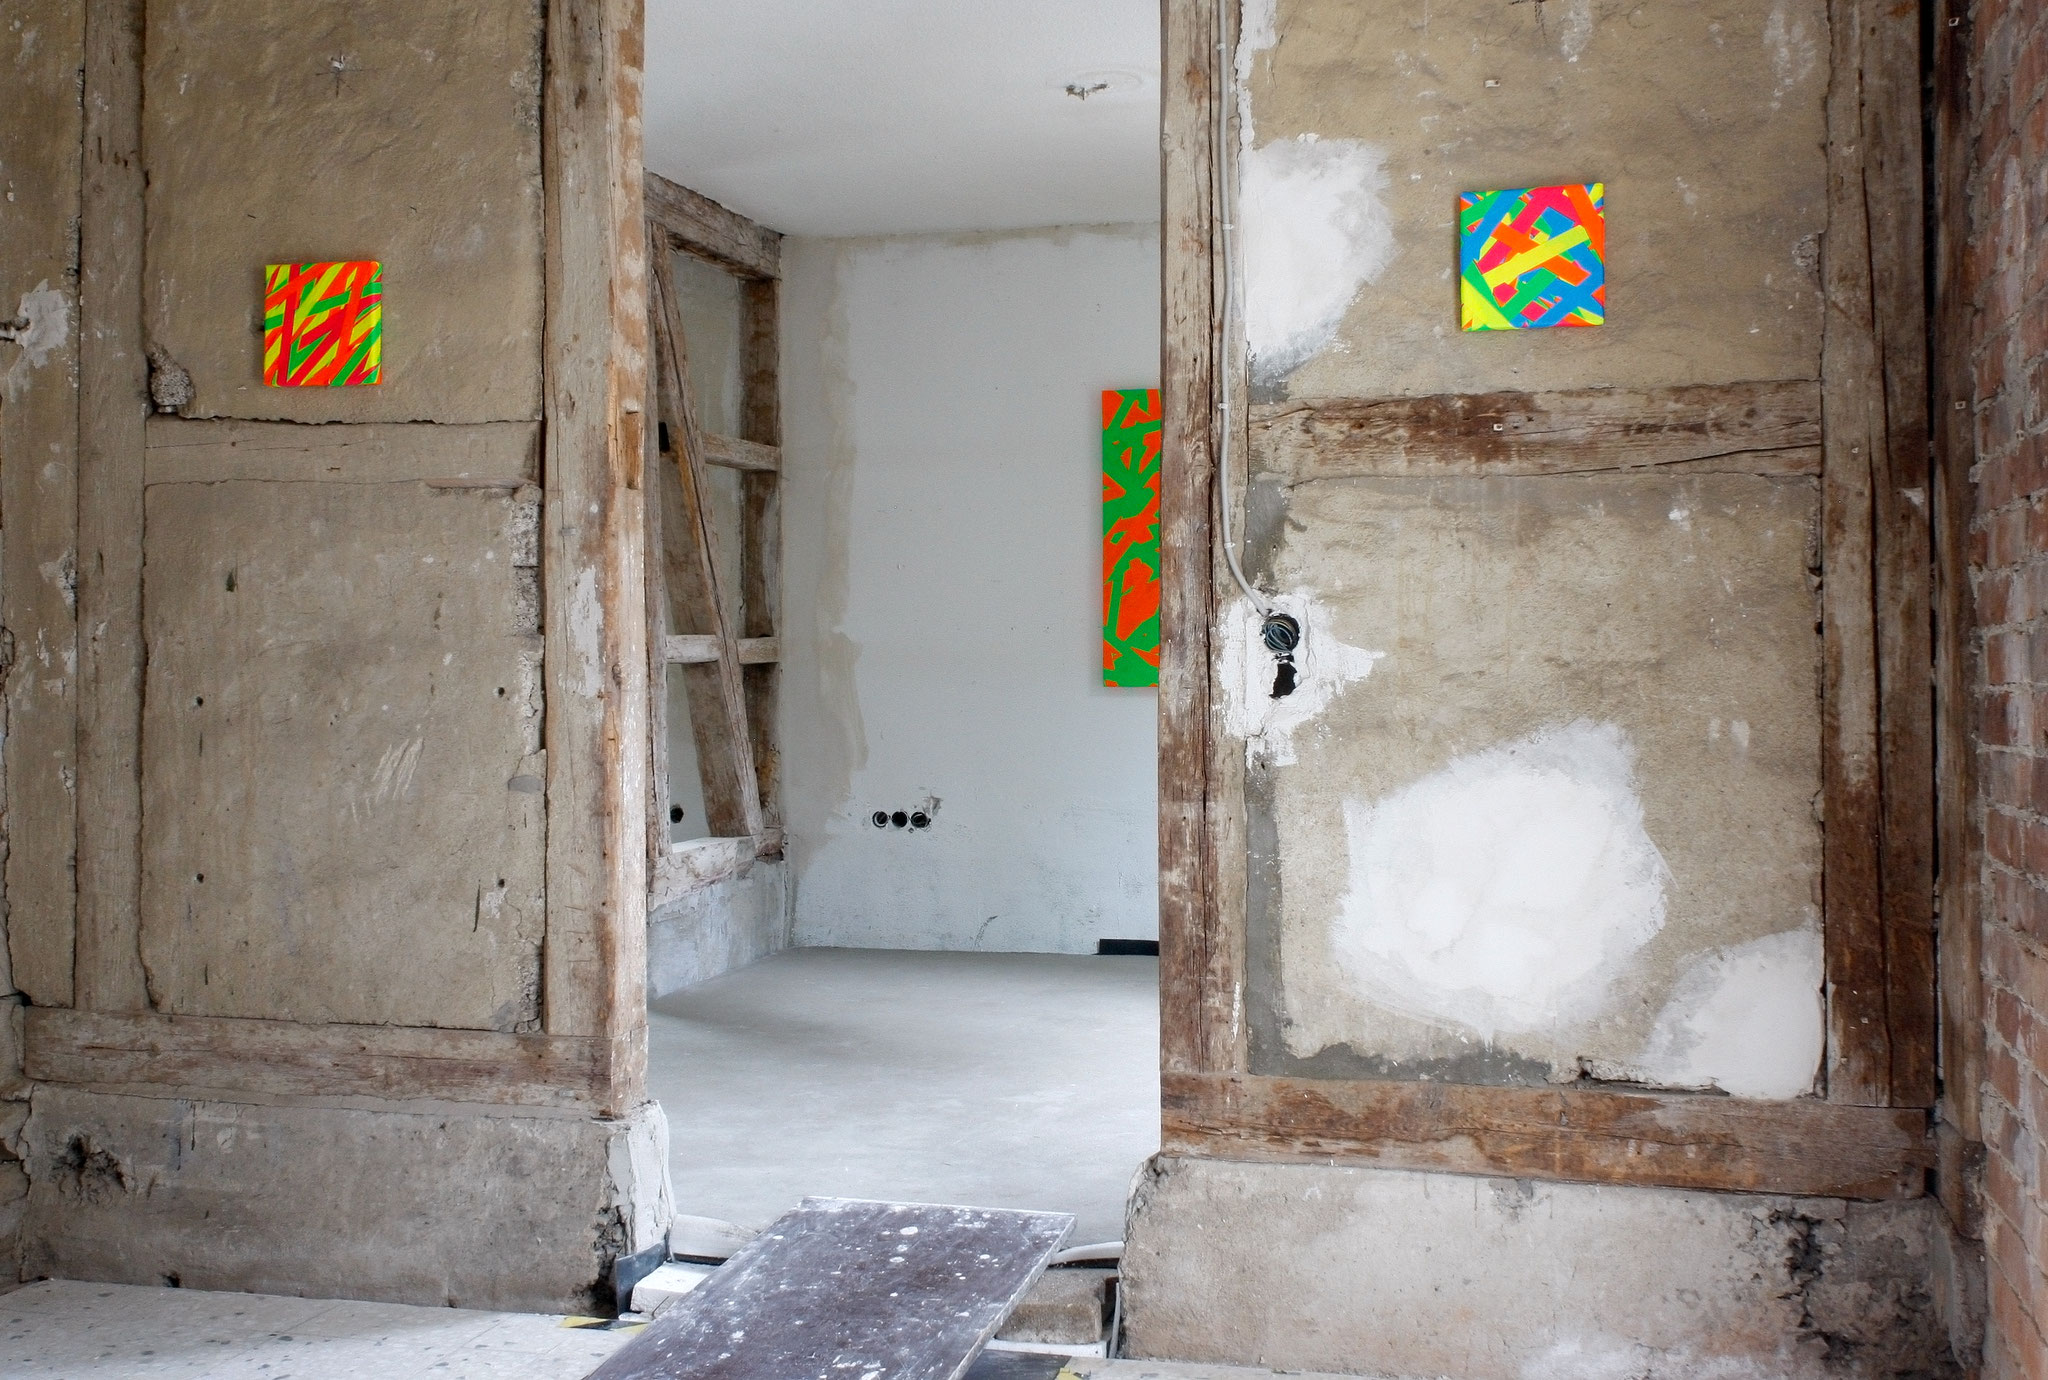 FLASH 44  Daniel Schörnig  SIGNAL,  2018 |  marking tape on canvas  |  New Space Brigitte March ICA